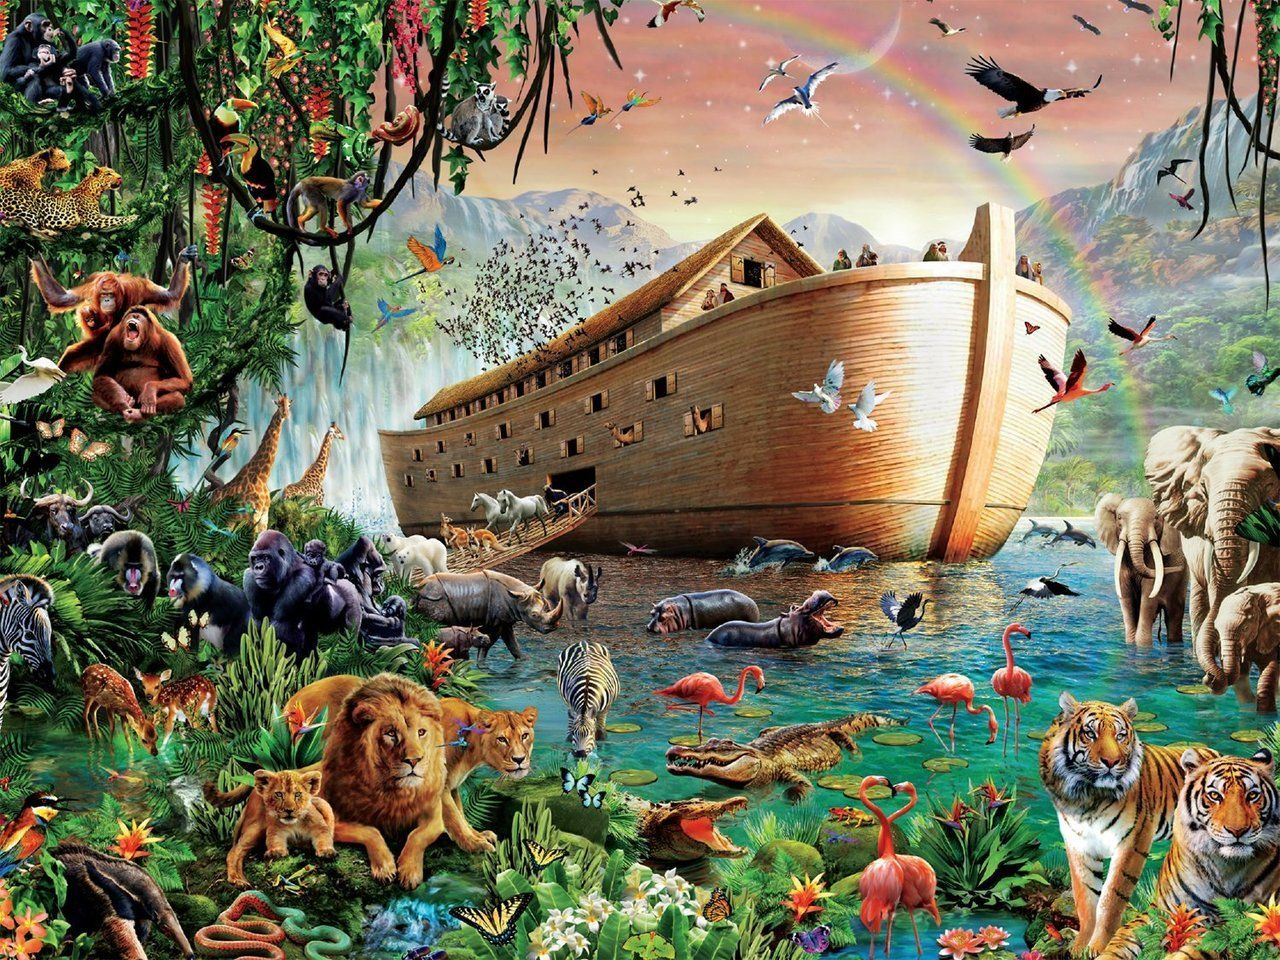 Noah S Ark 4000pc Jigsaw Puzzle By Tomax Noahs Ark Bible Pictures Biblical Art